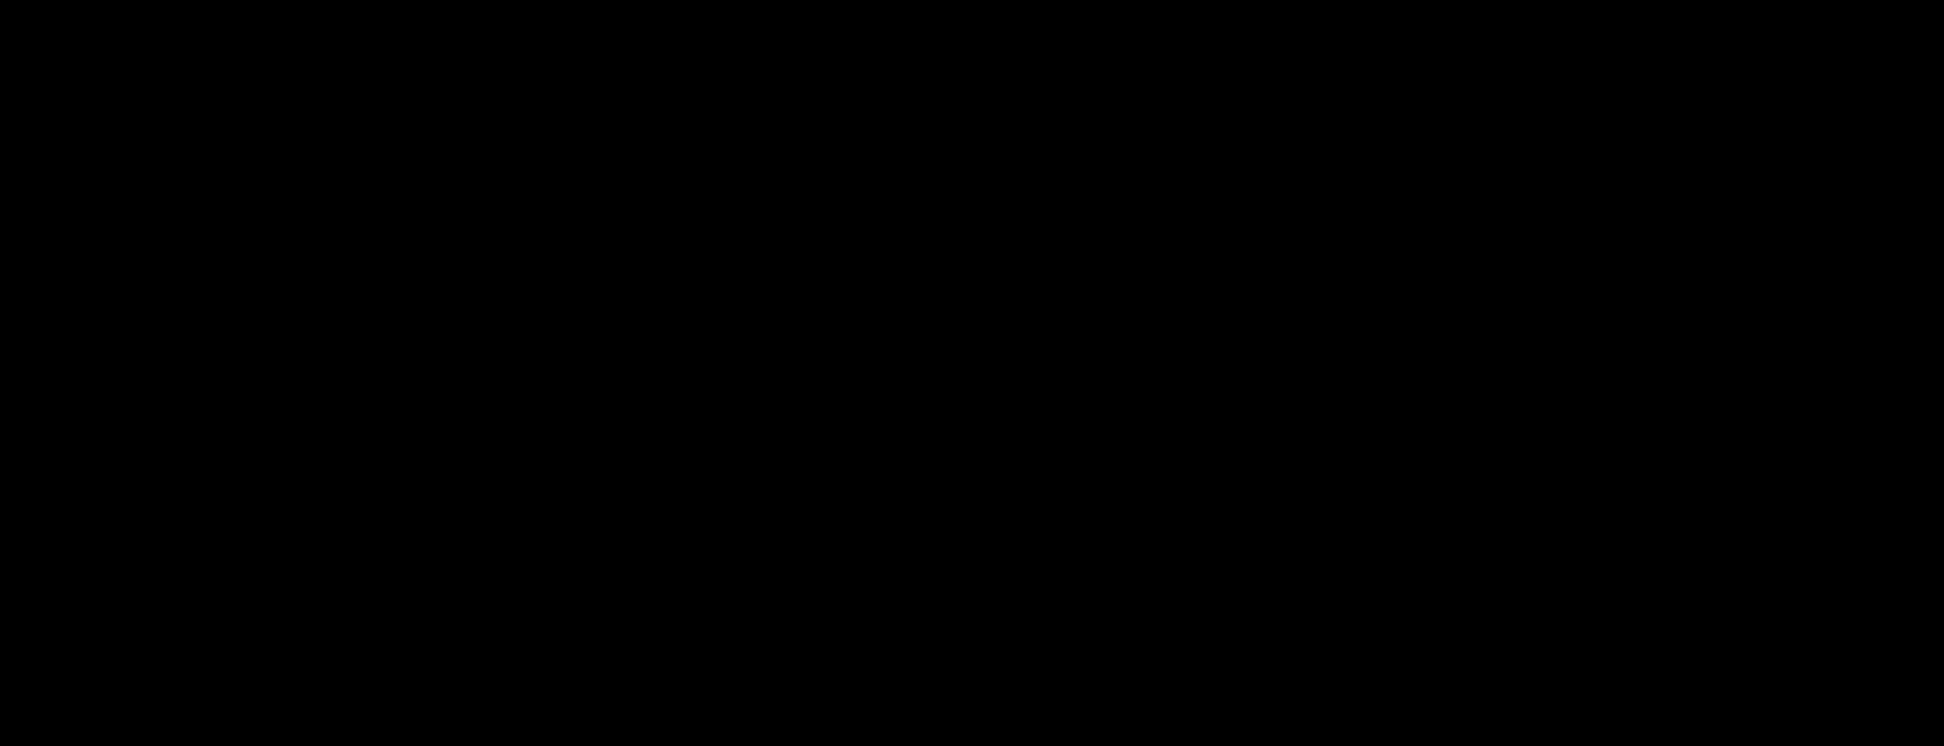 tert-Butyl 5-(7-hydroxycoumarin-4-acetamido)pentyl carbamate